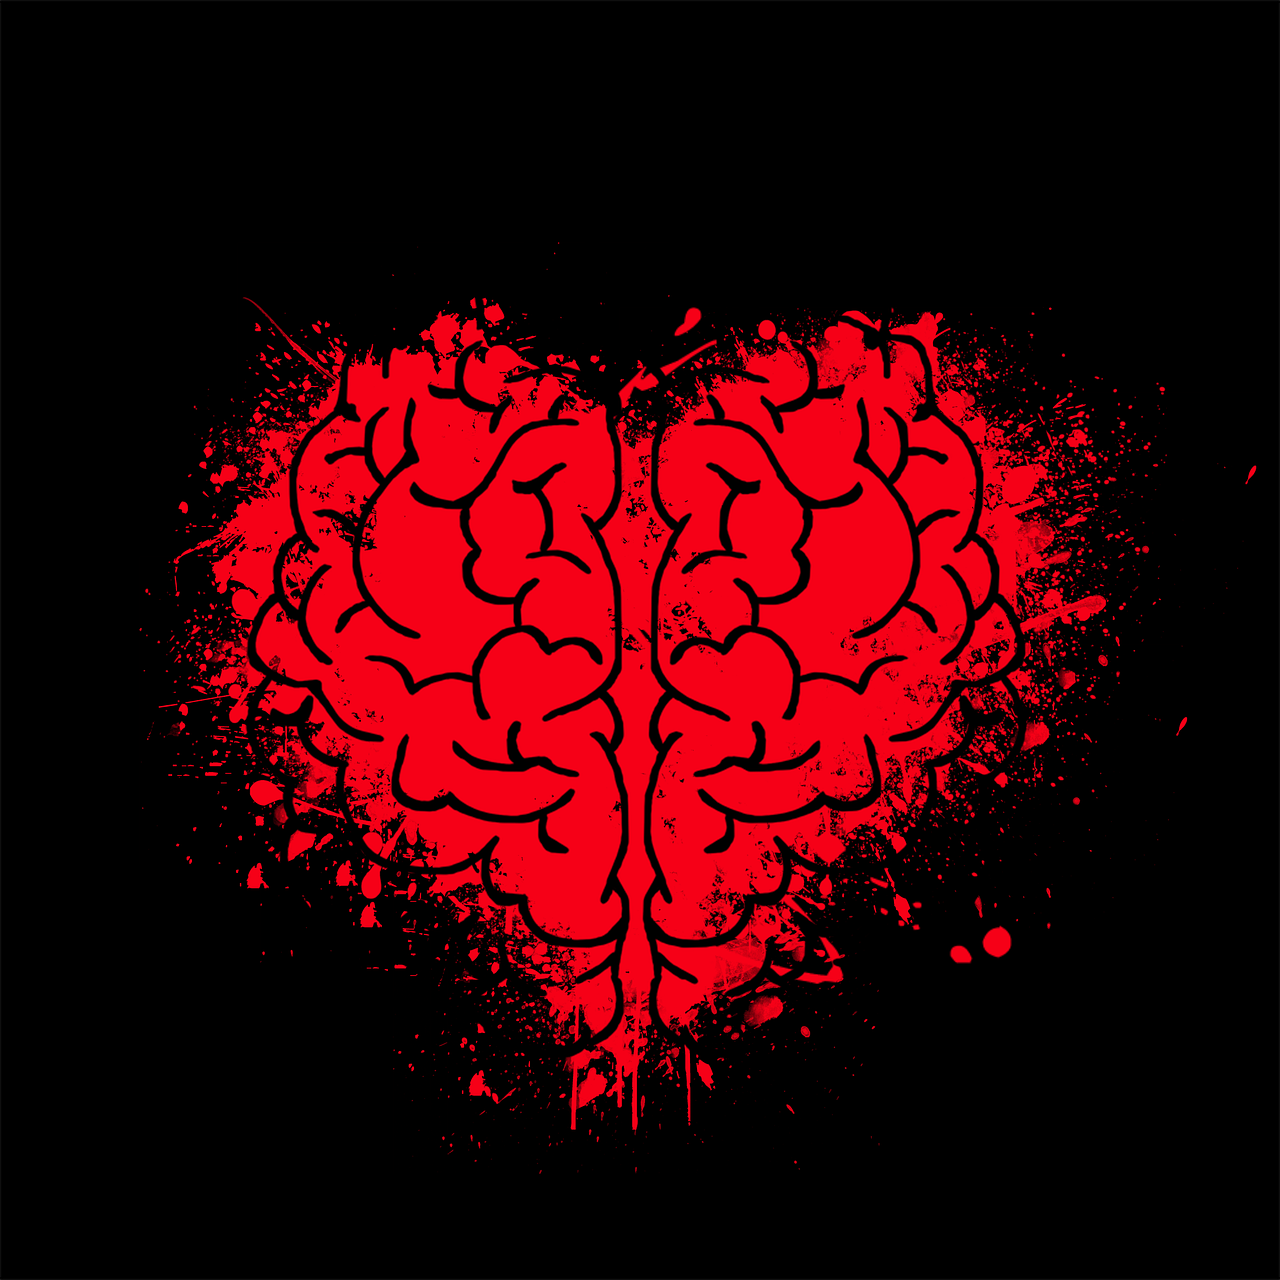 heart 2356621 1280 1